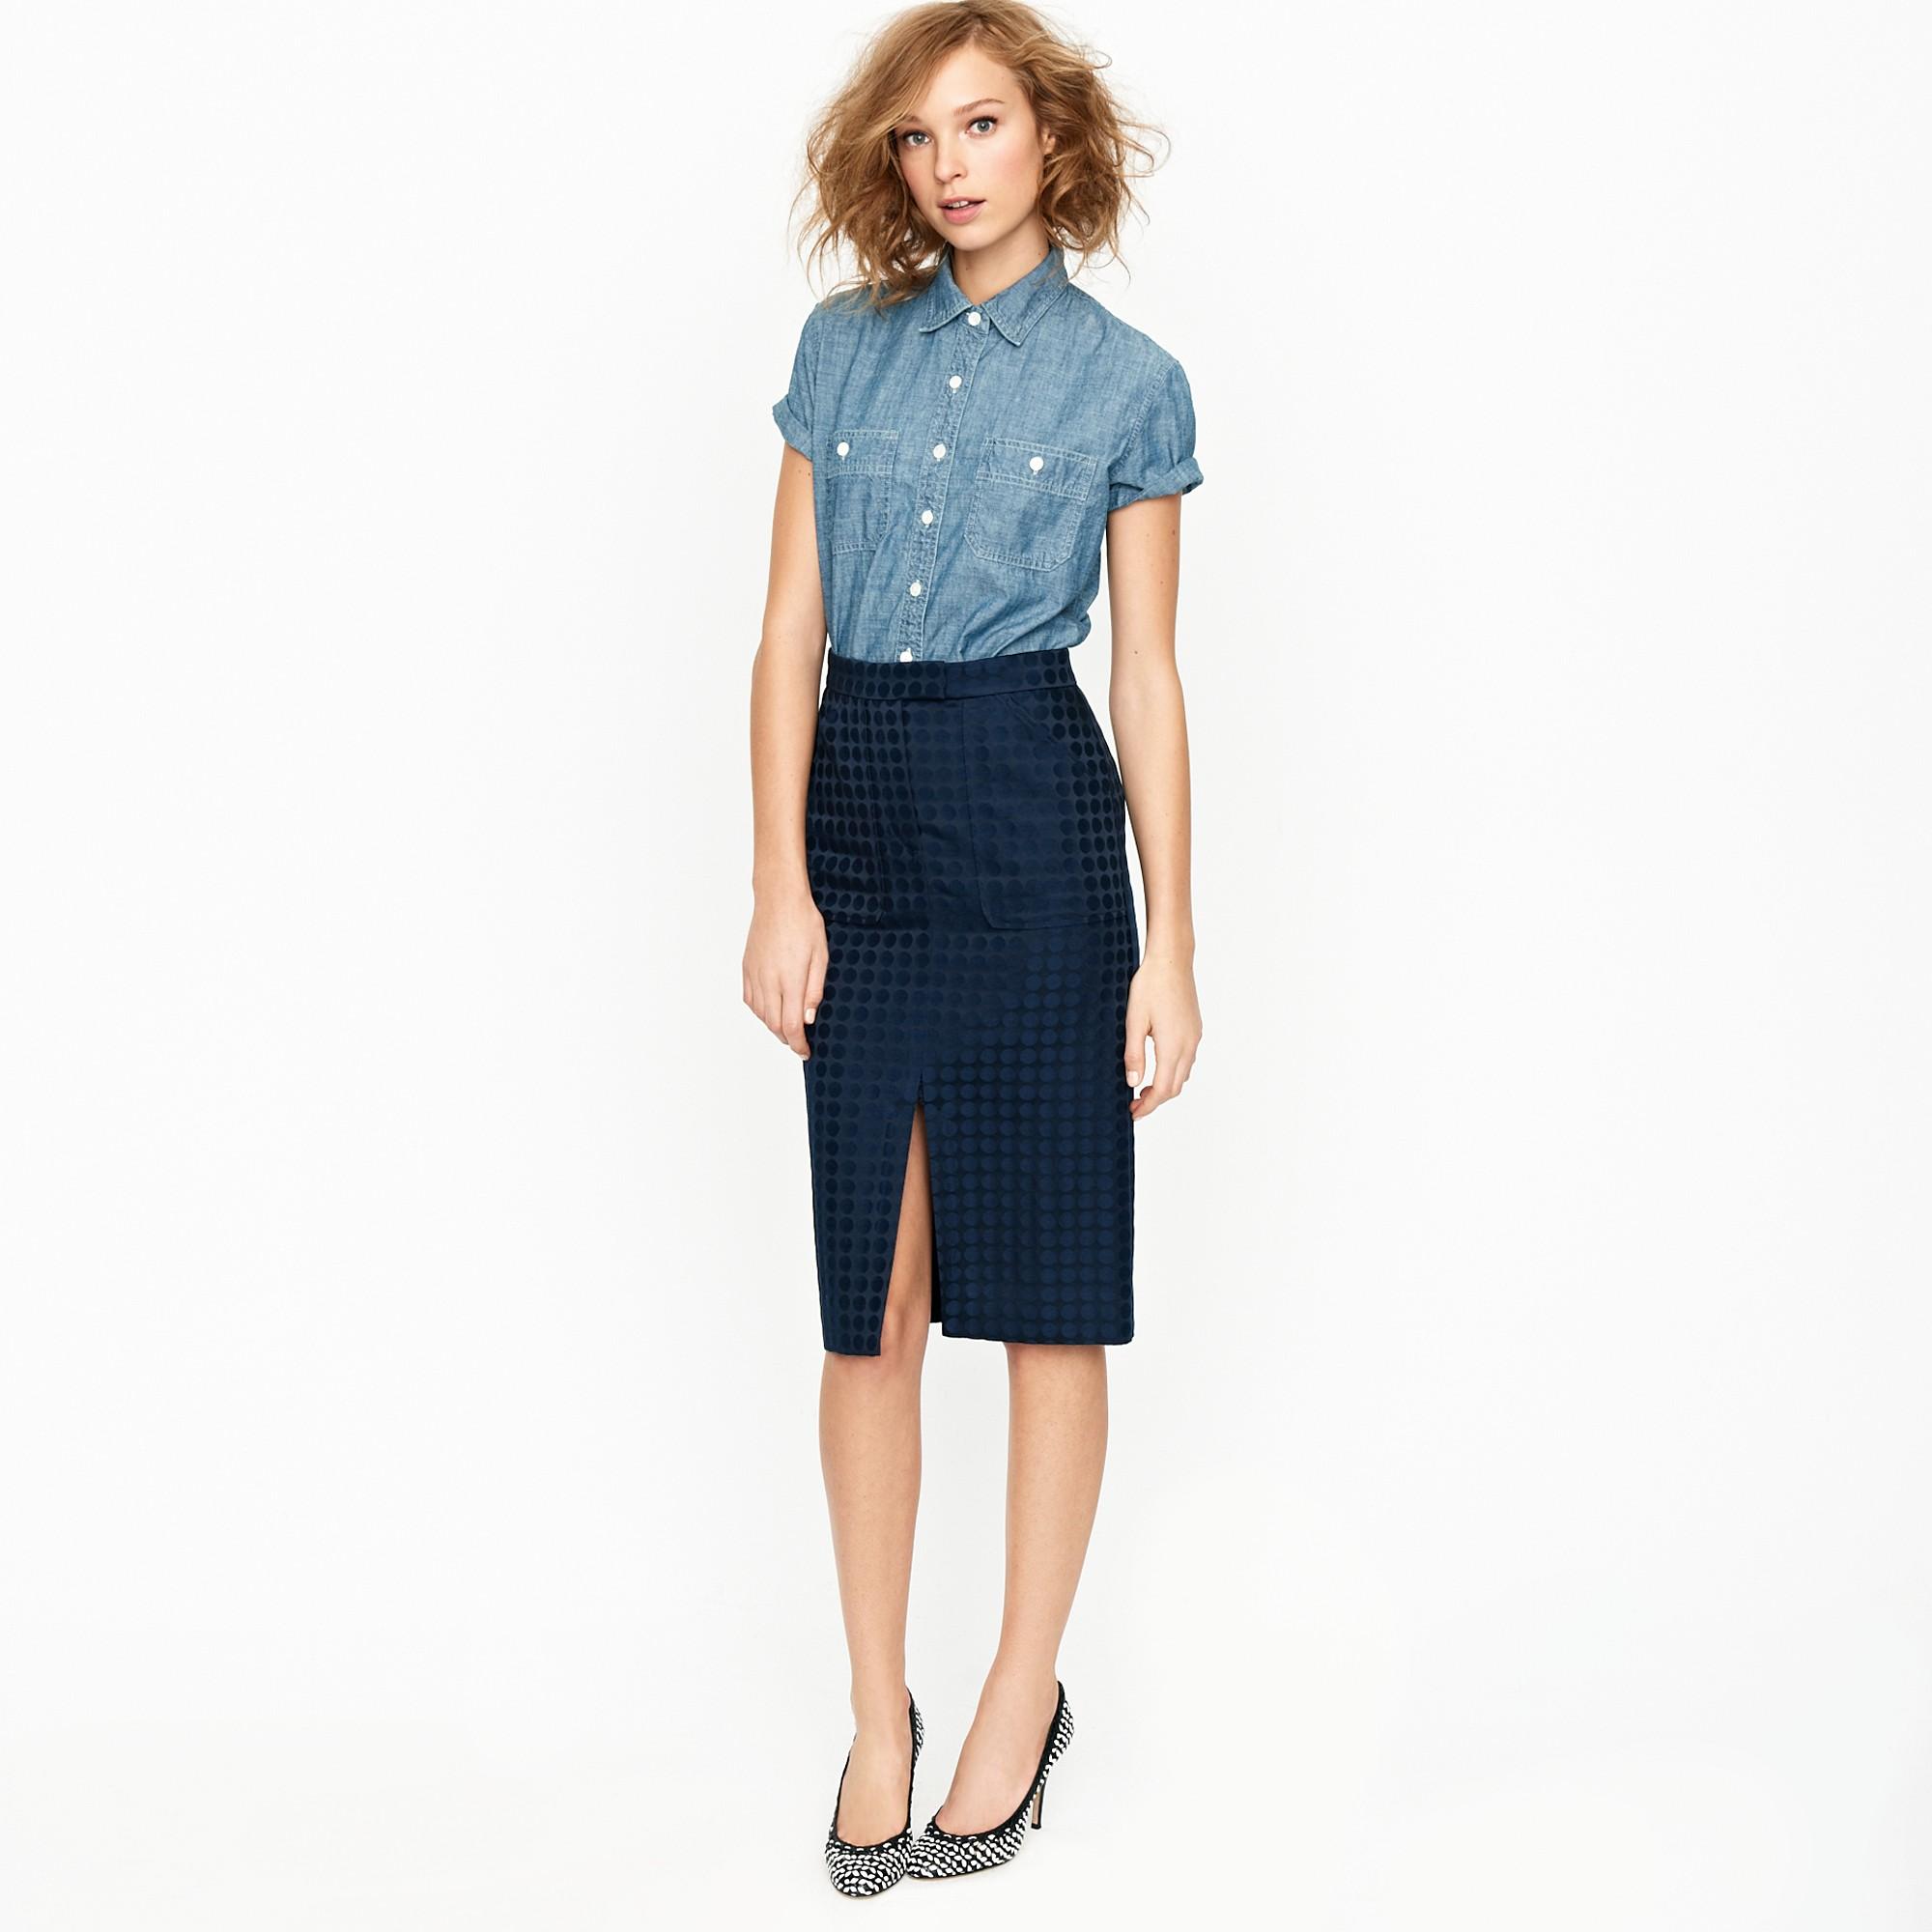 j crew jacquard dot pencil skirt in blue lyst